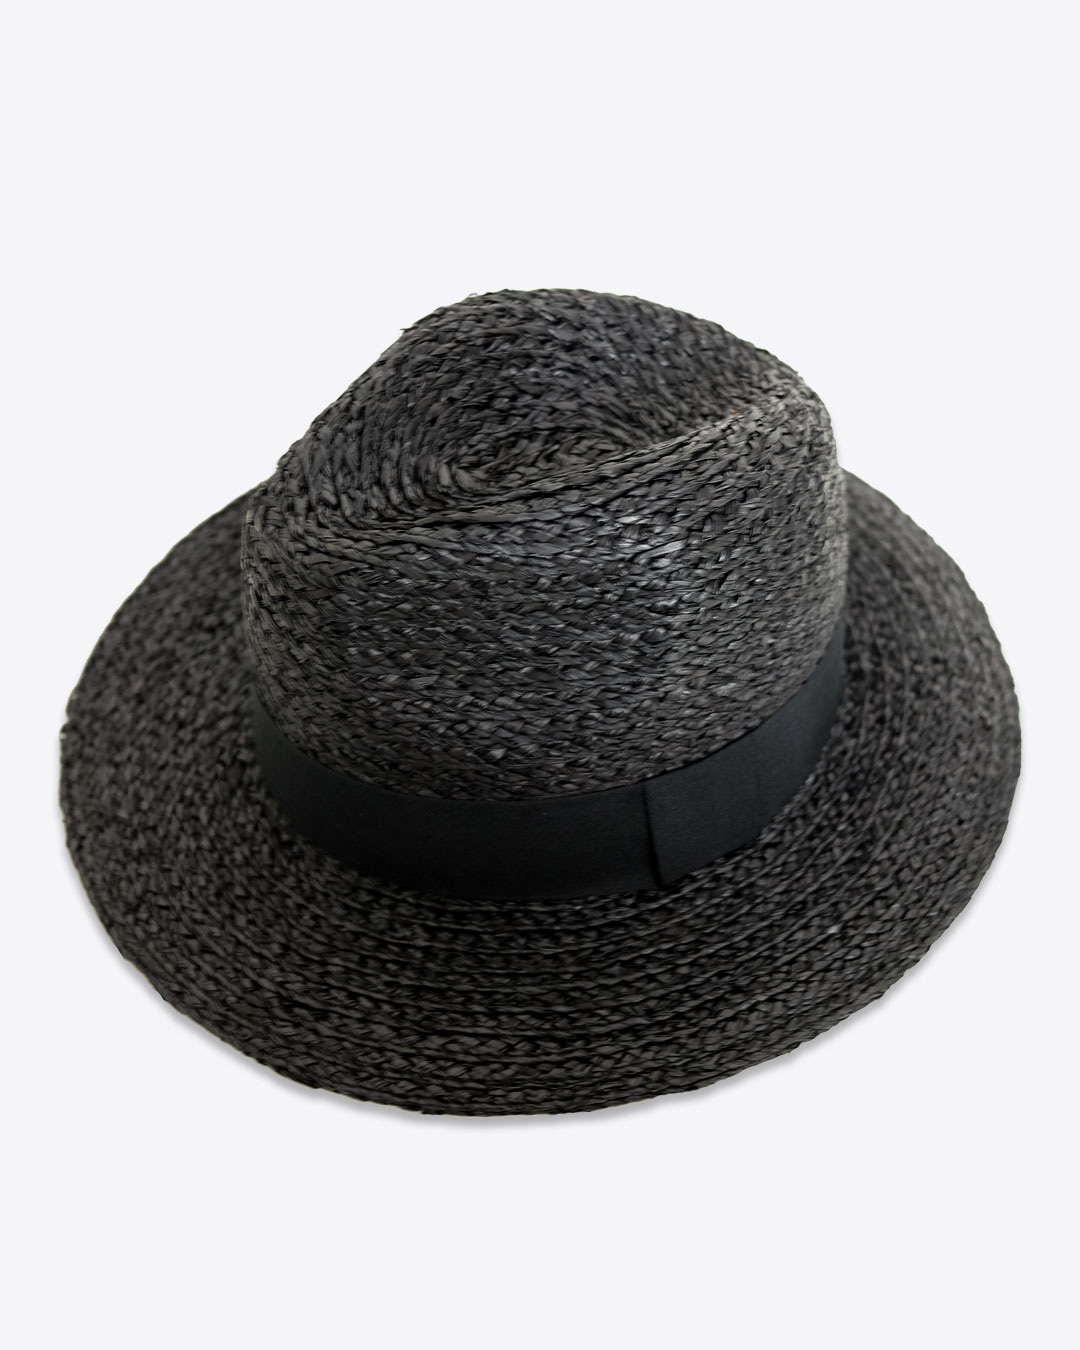 9804648fed00e Raffia Straw Fedora Hat – URBANE MUSE CHRIS SMITH™